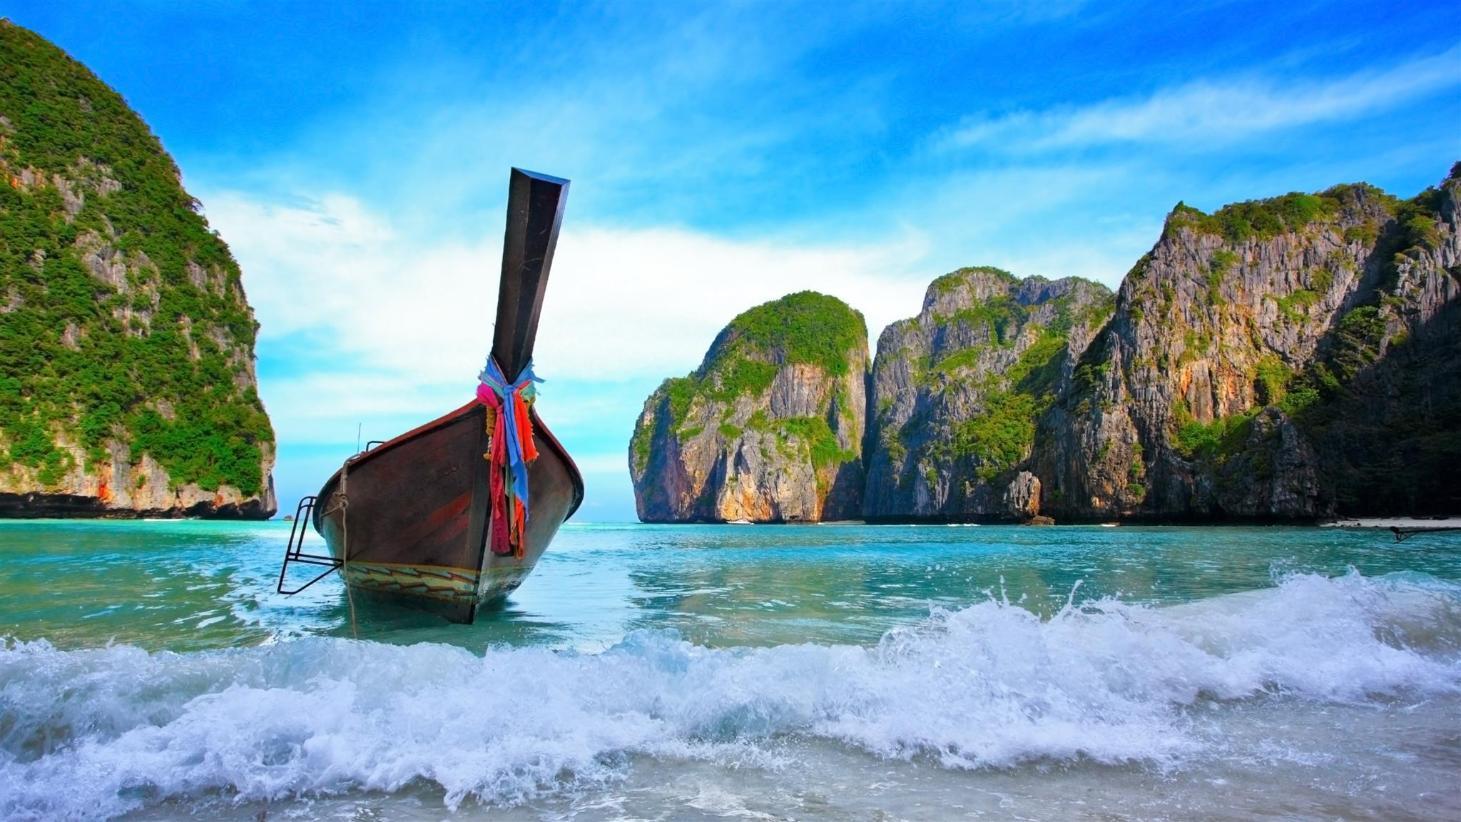 Koh Phi Phi Bungalows - Sparpreise + HD-Fotos von Bungalows ...